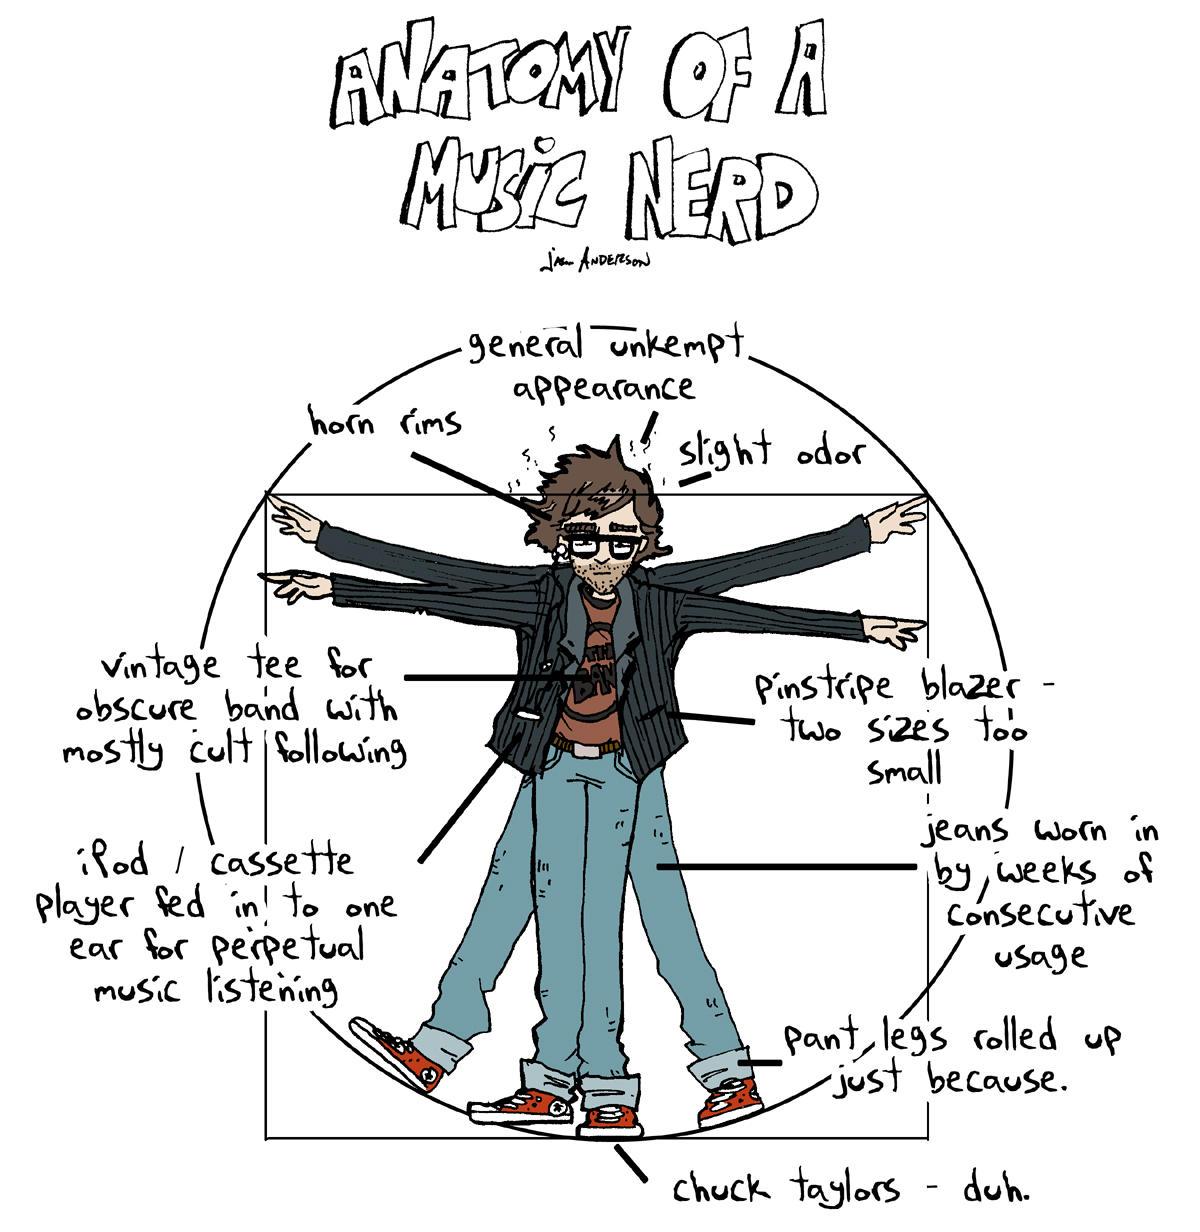 Anatomy of music 6360944 - follow4more.info